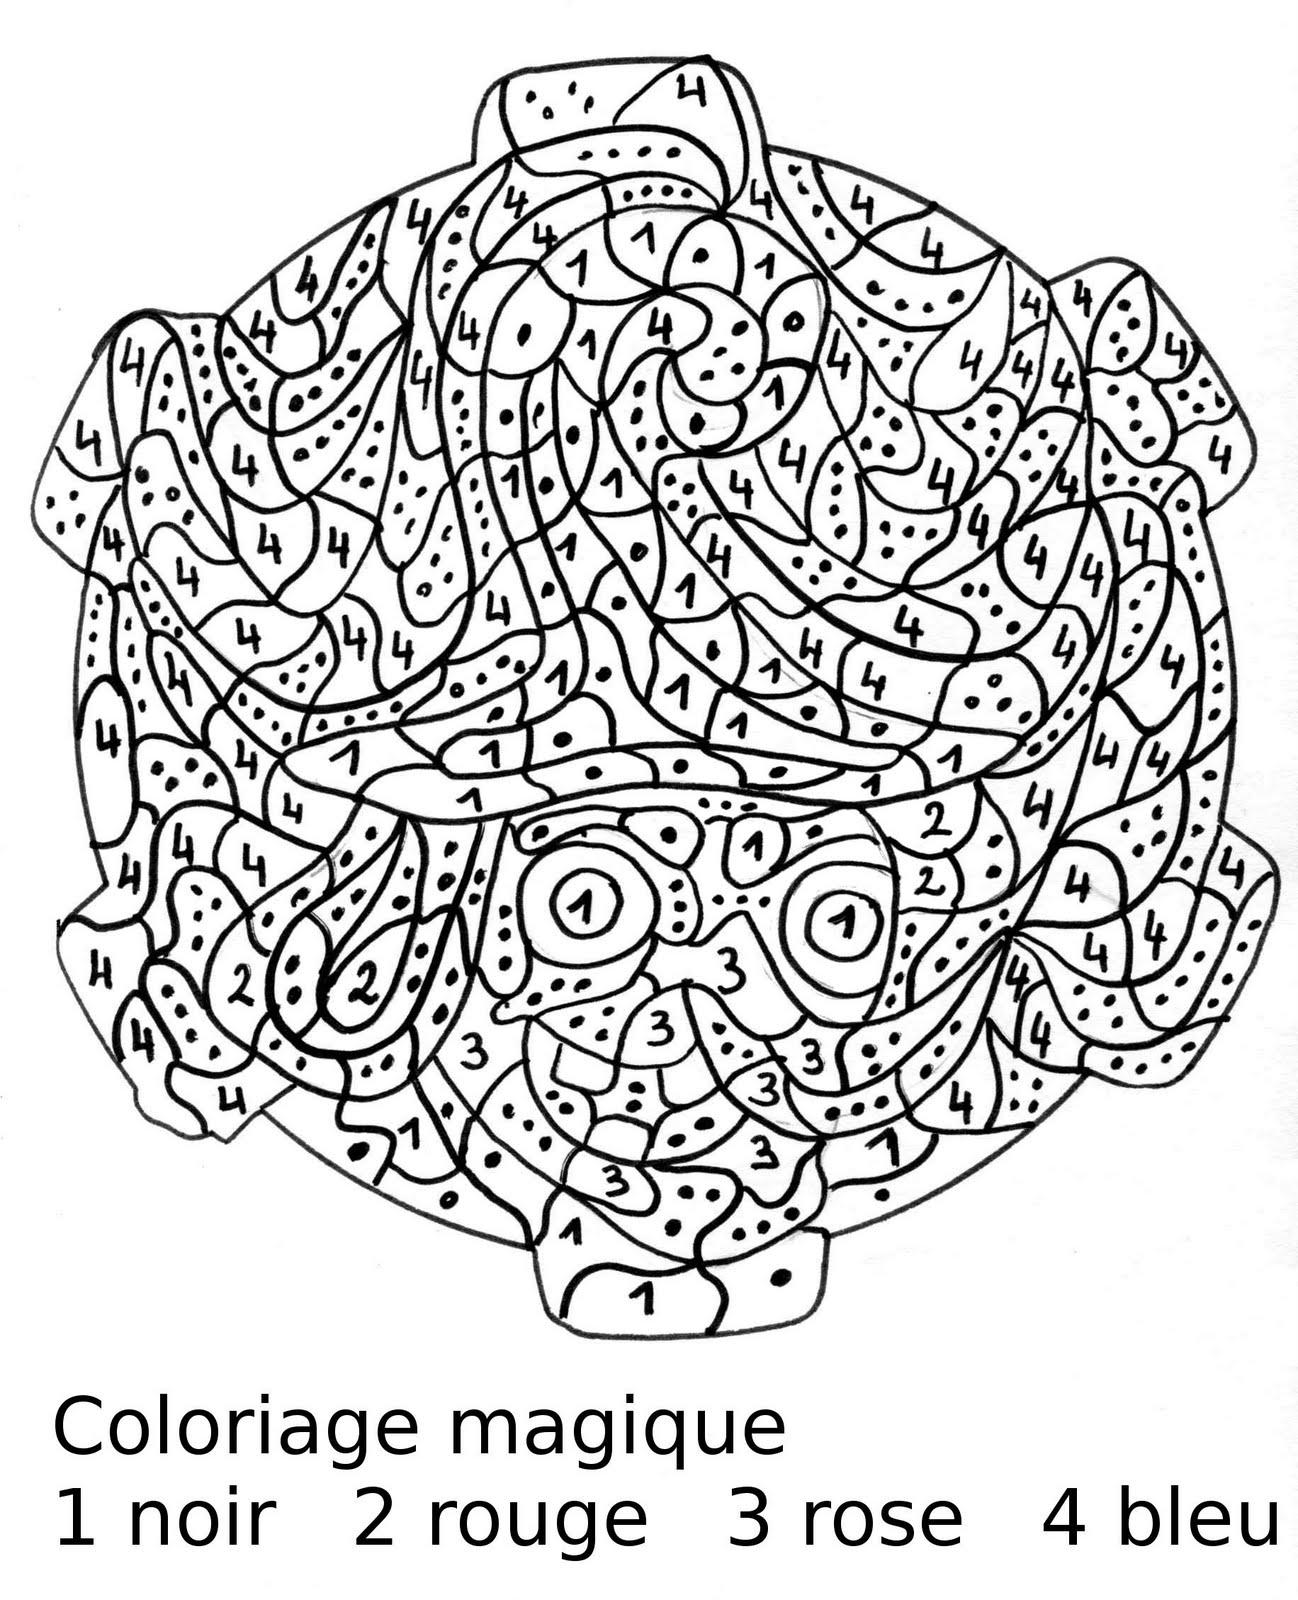 coloriage magique princesse | Liberate